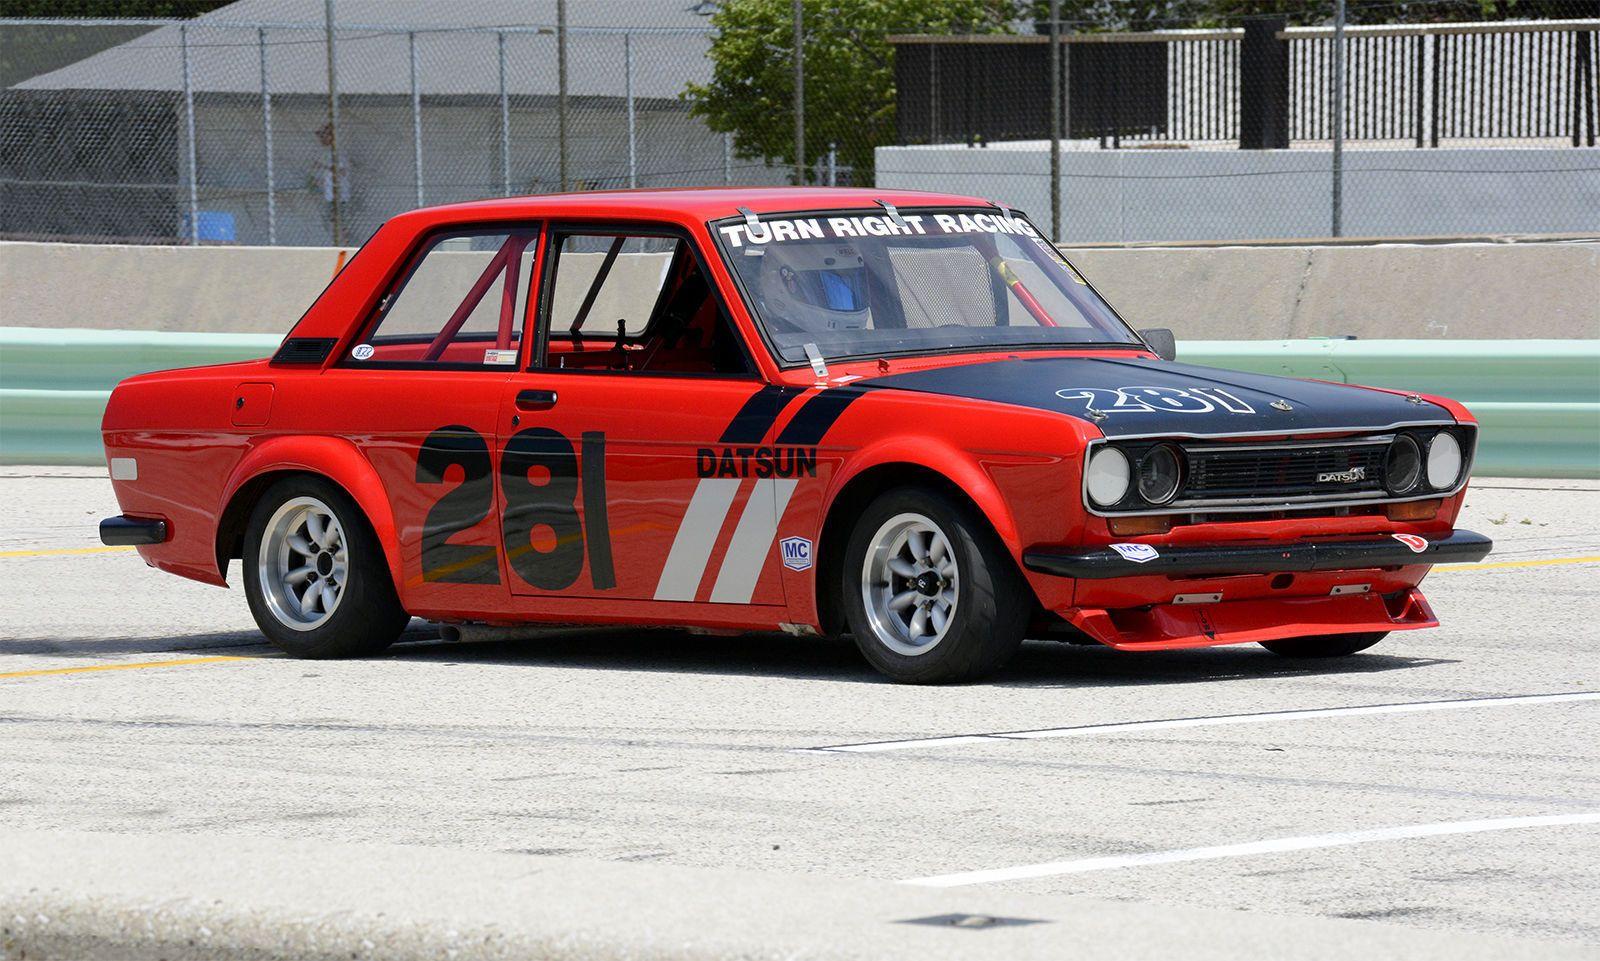 Datsun 510 Race Car | Classic Cars | Pinterest | Datsun 510 ...